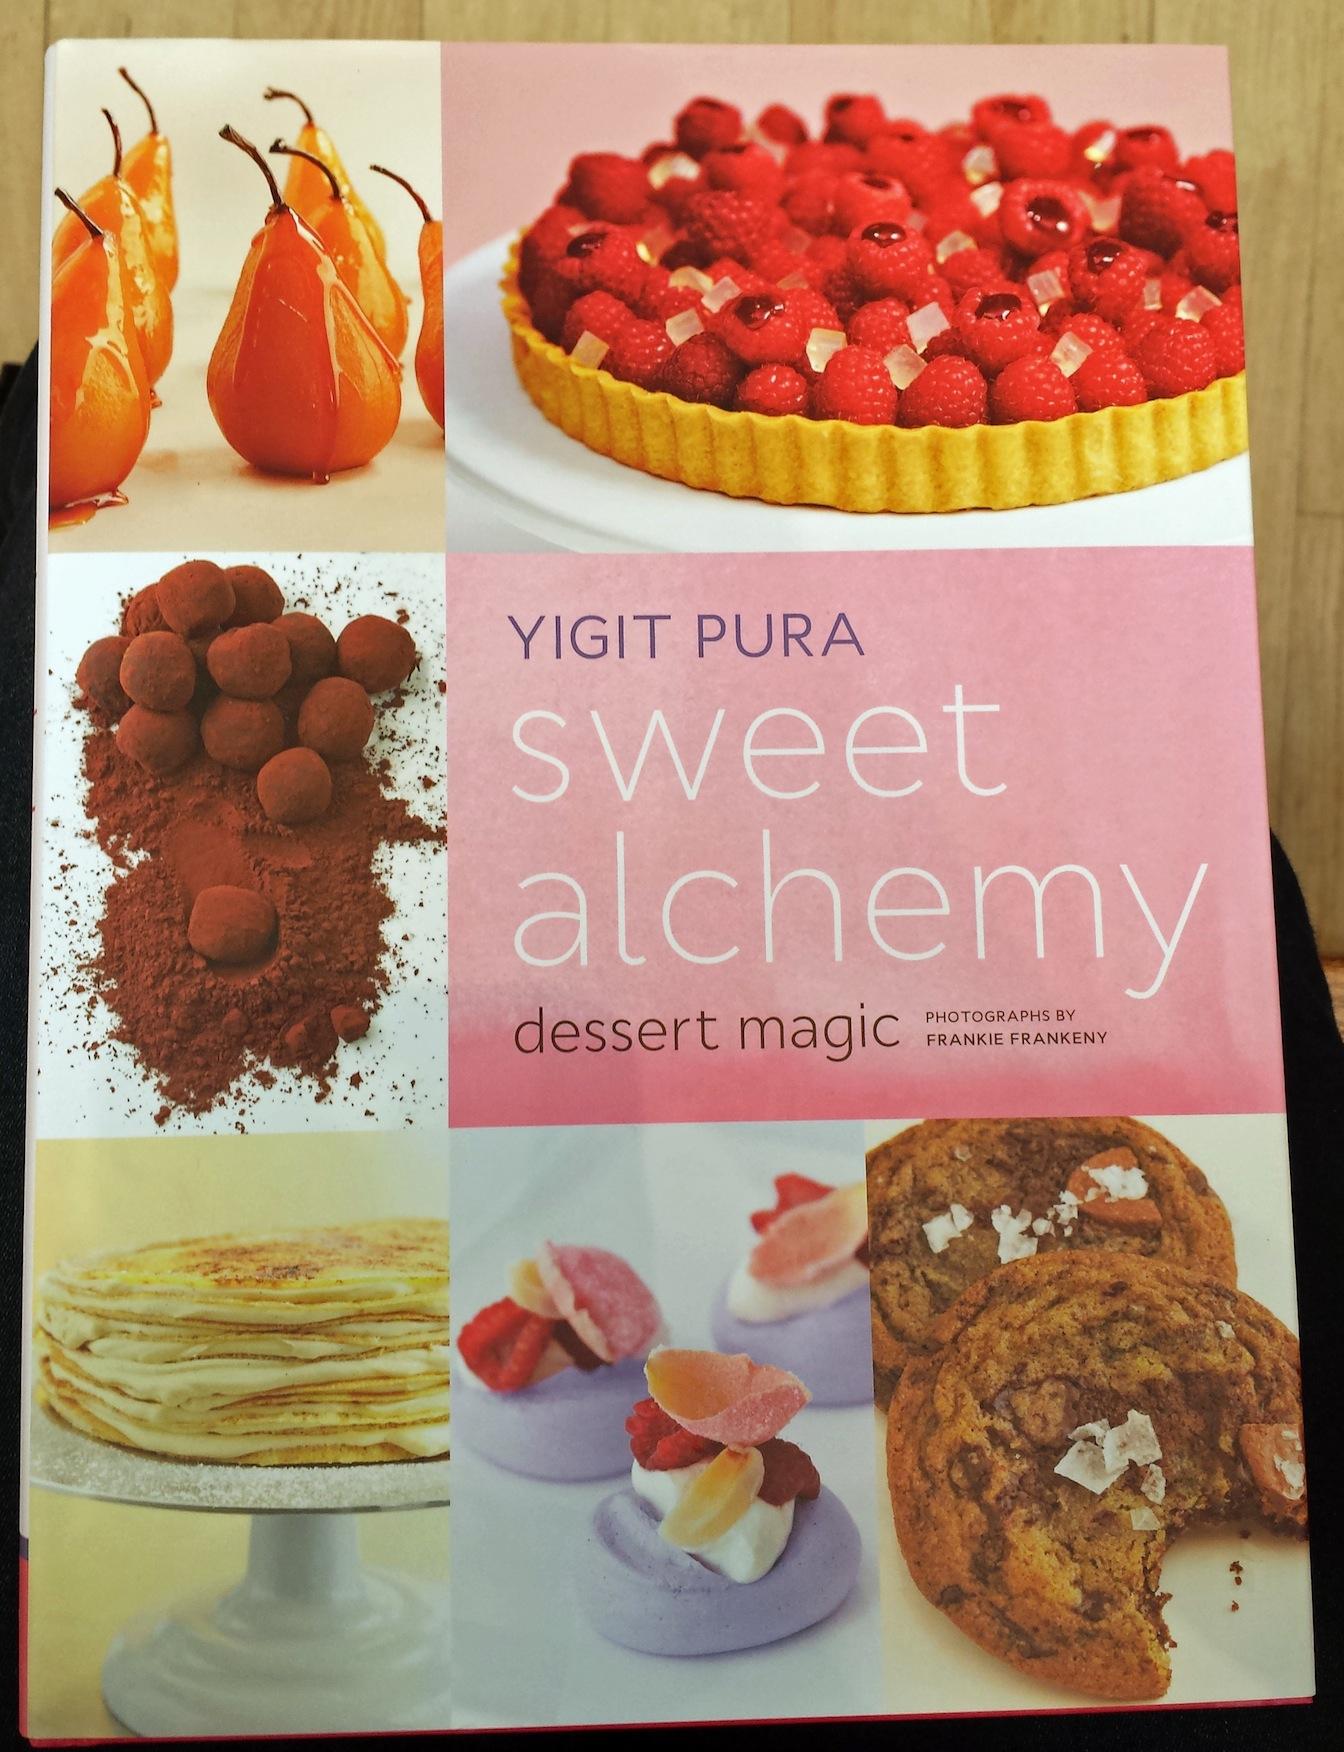 Yigit Pura Sweet Alchemy